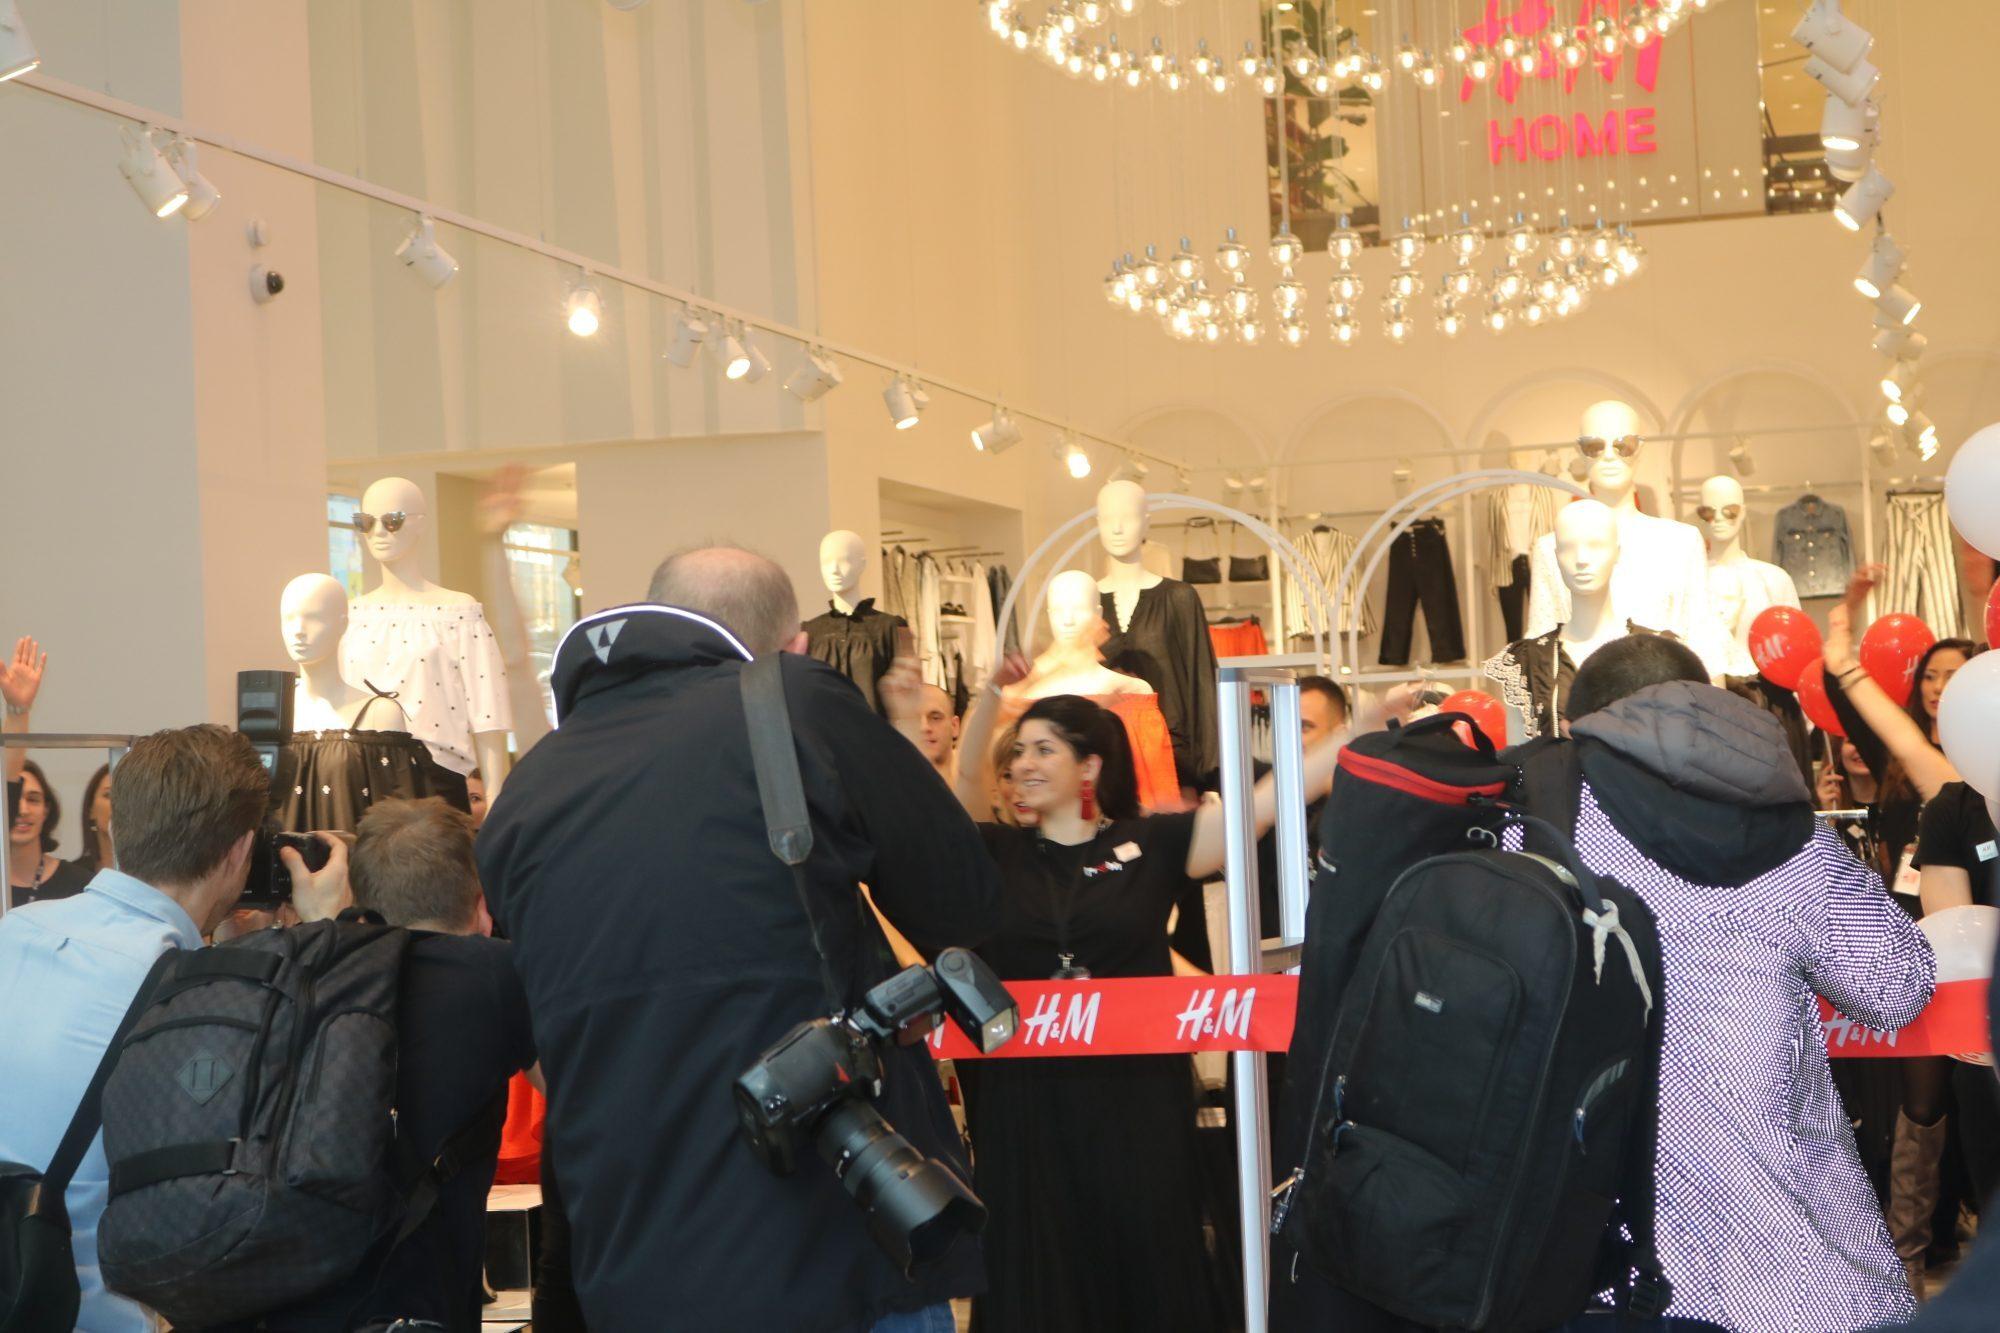 H&M Free Vouchers W12 Shopping Center